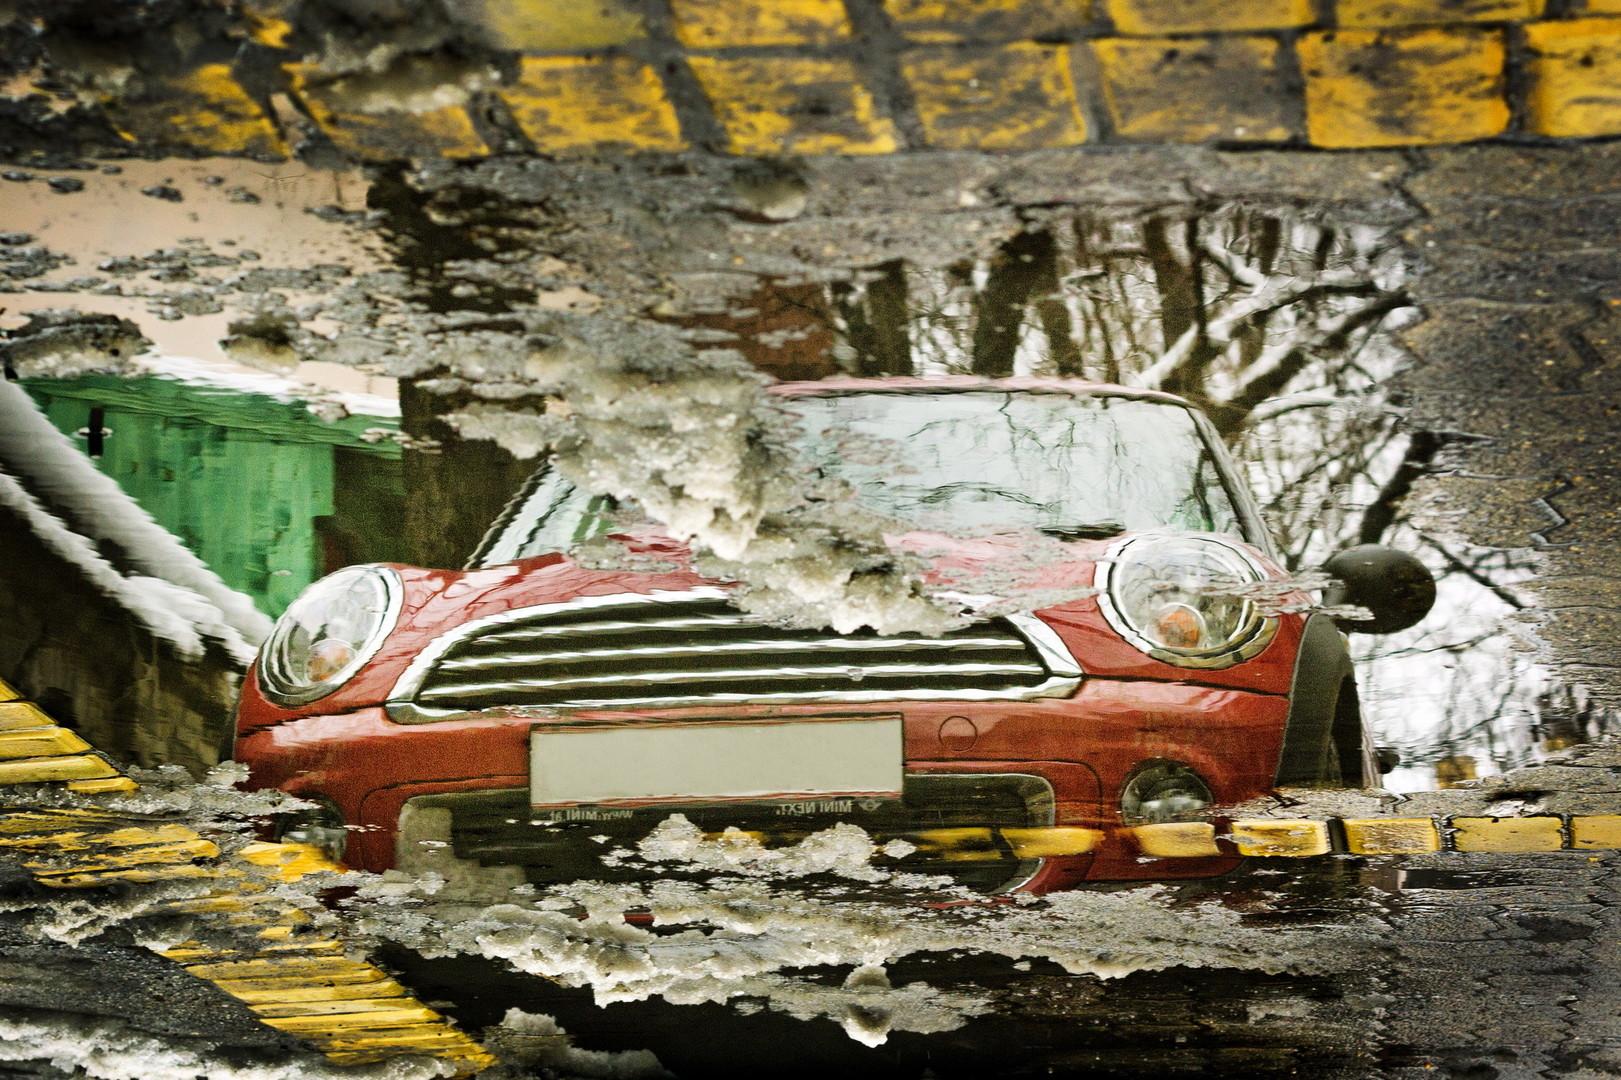 Crveni auto